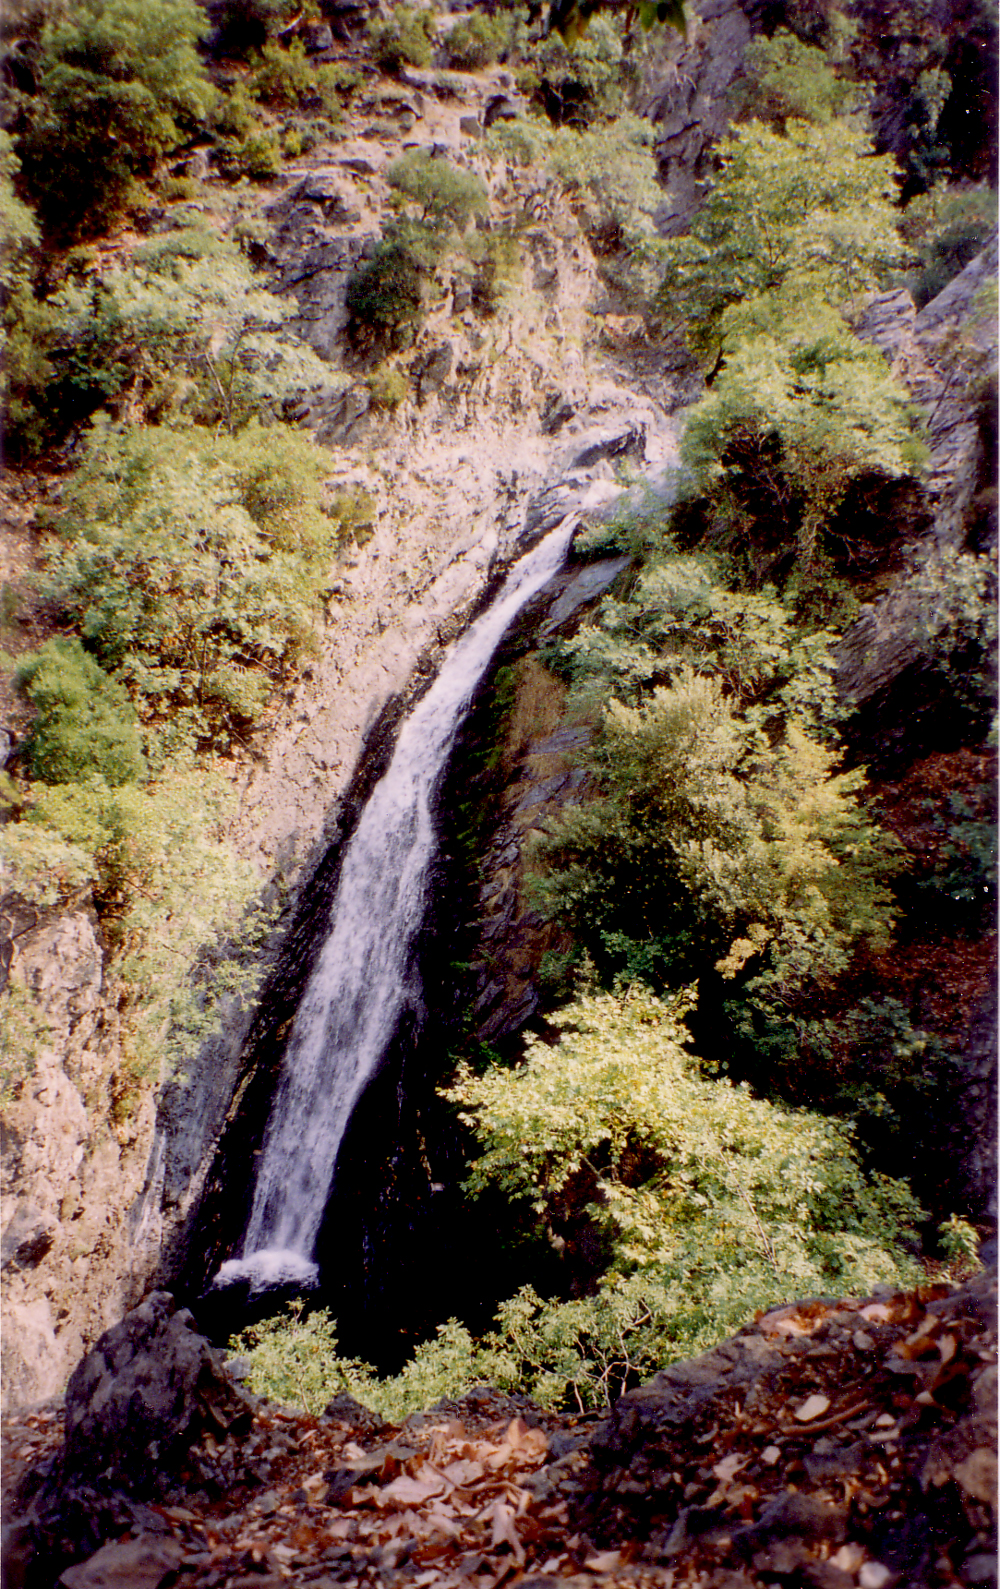 File:Samothraki fonias waterfall.jpg - Wikimedia Commons